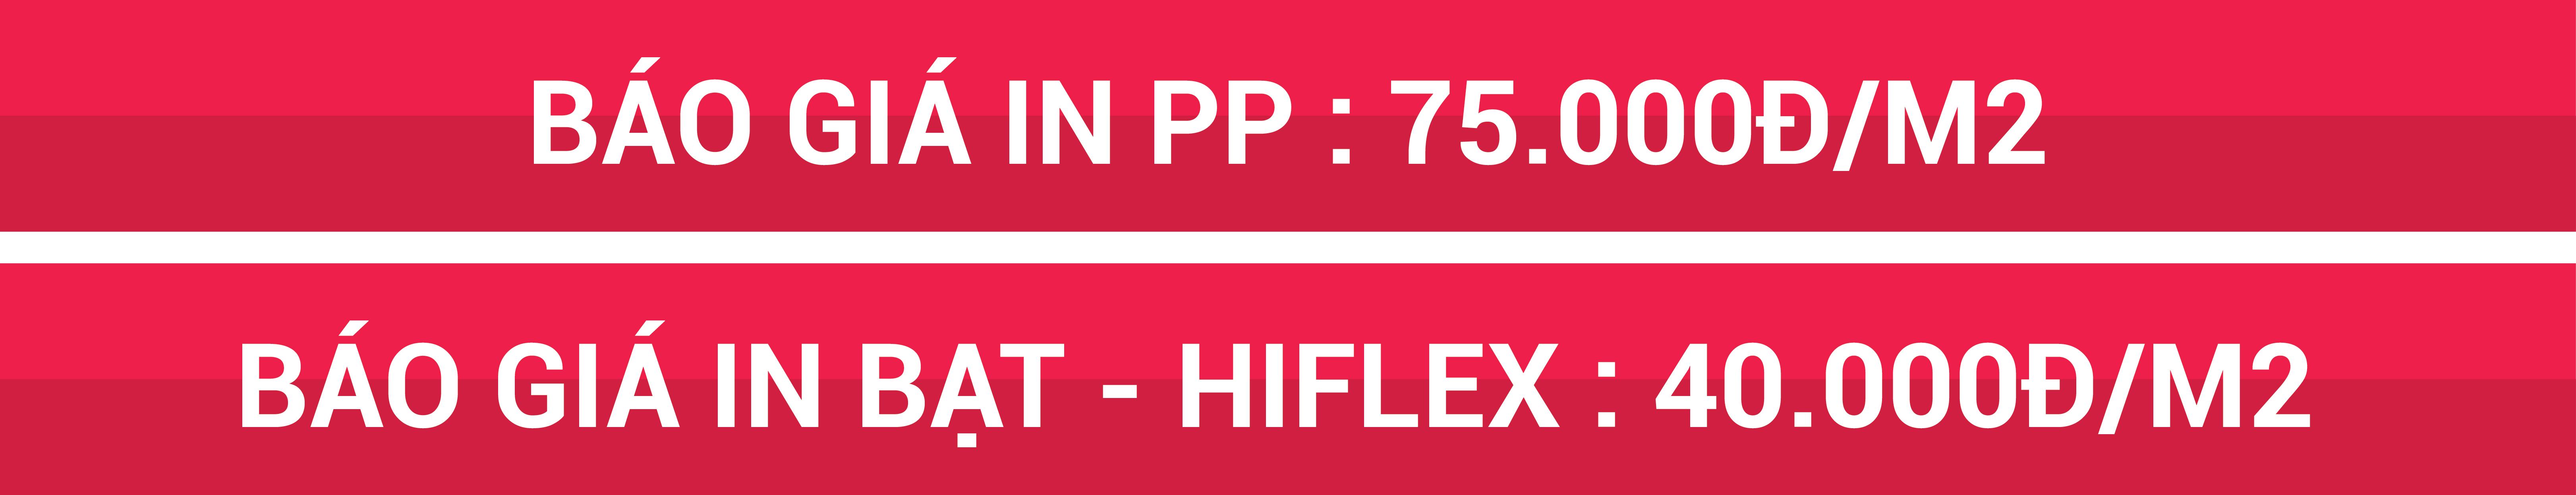 in-hiflex-in-pp